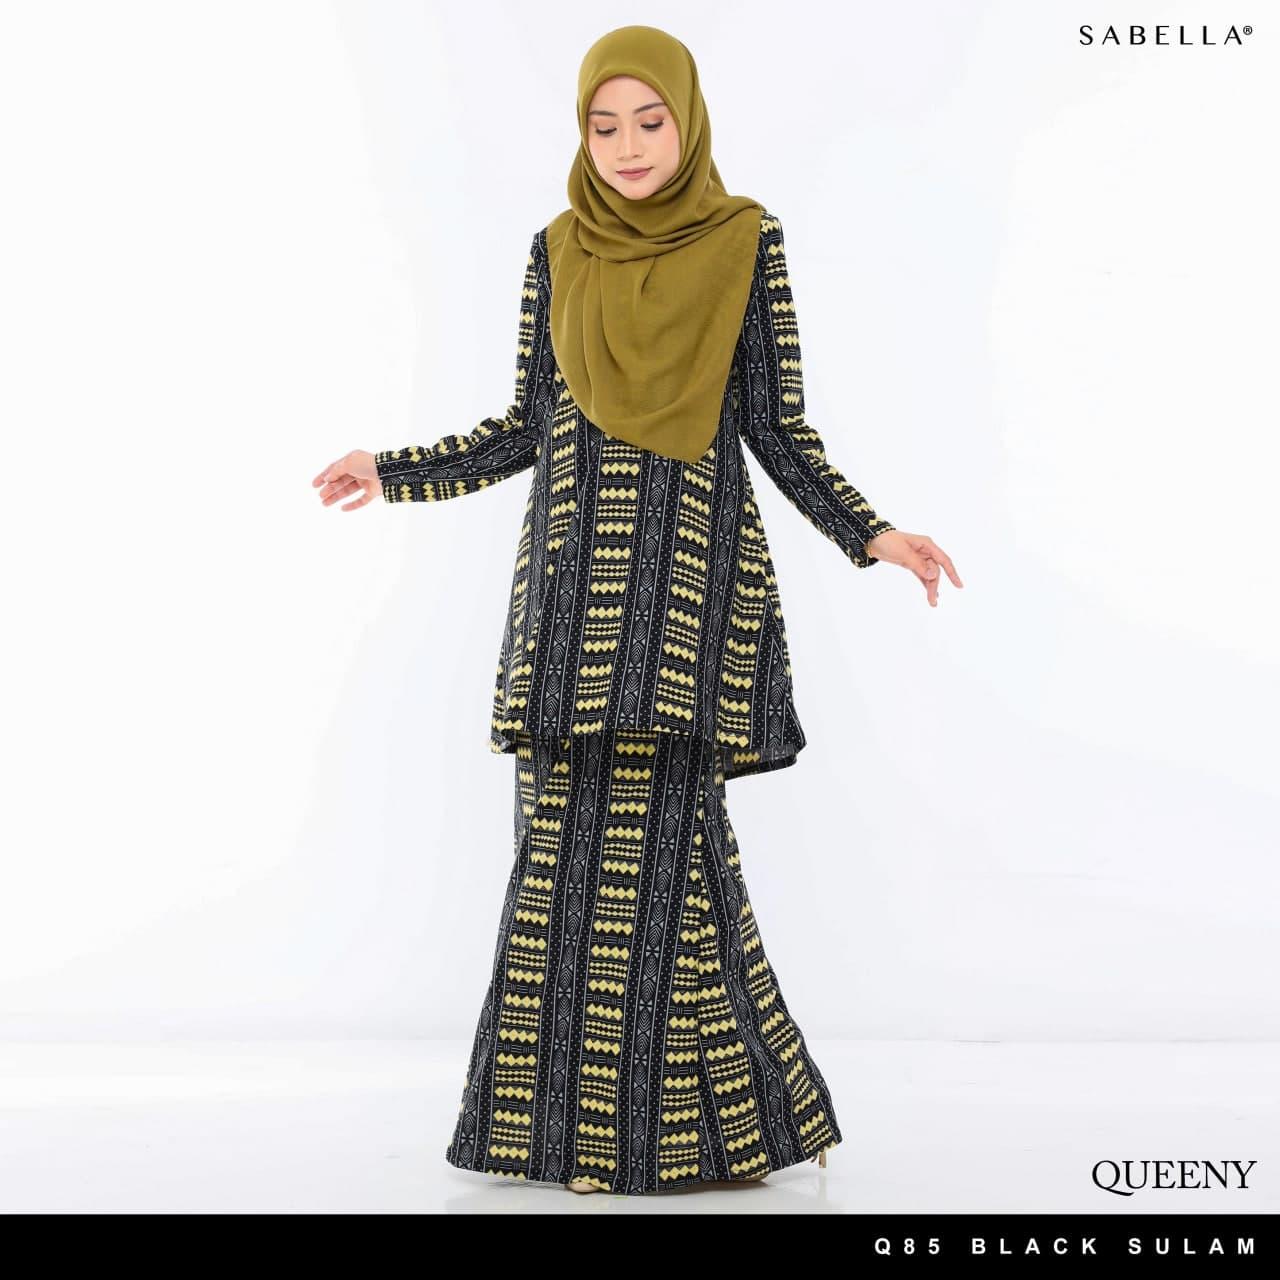 Queeny Eighty Five Black Sulam